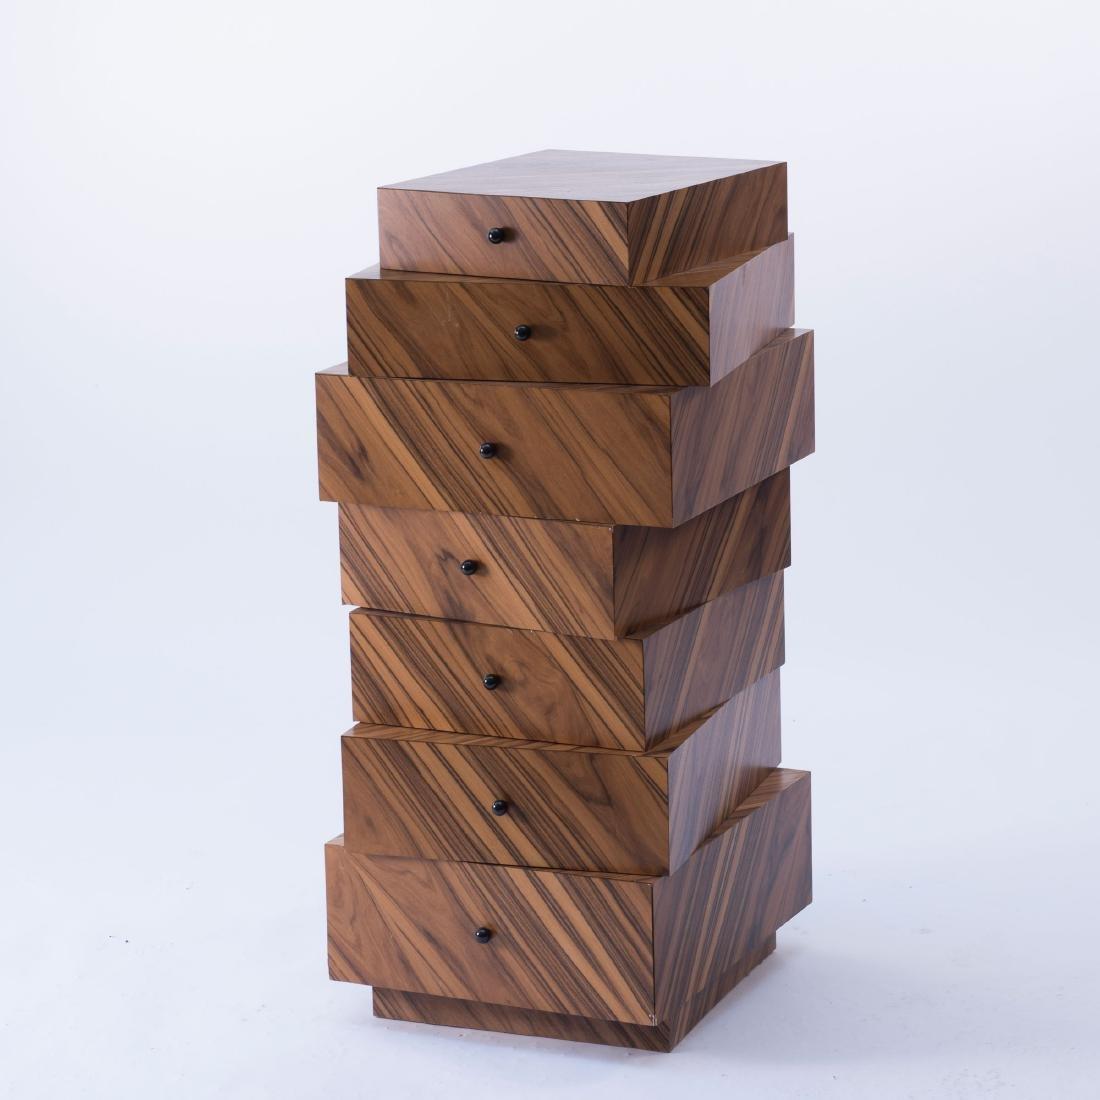 'Schubladenstapel' dresser, 1982 - 2